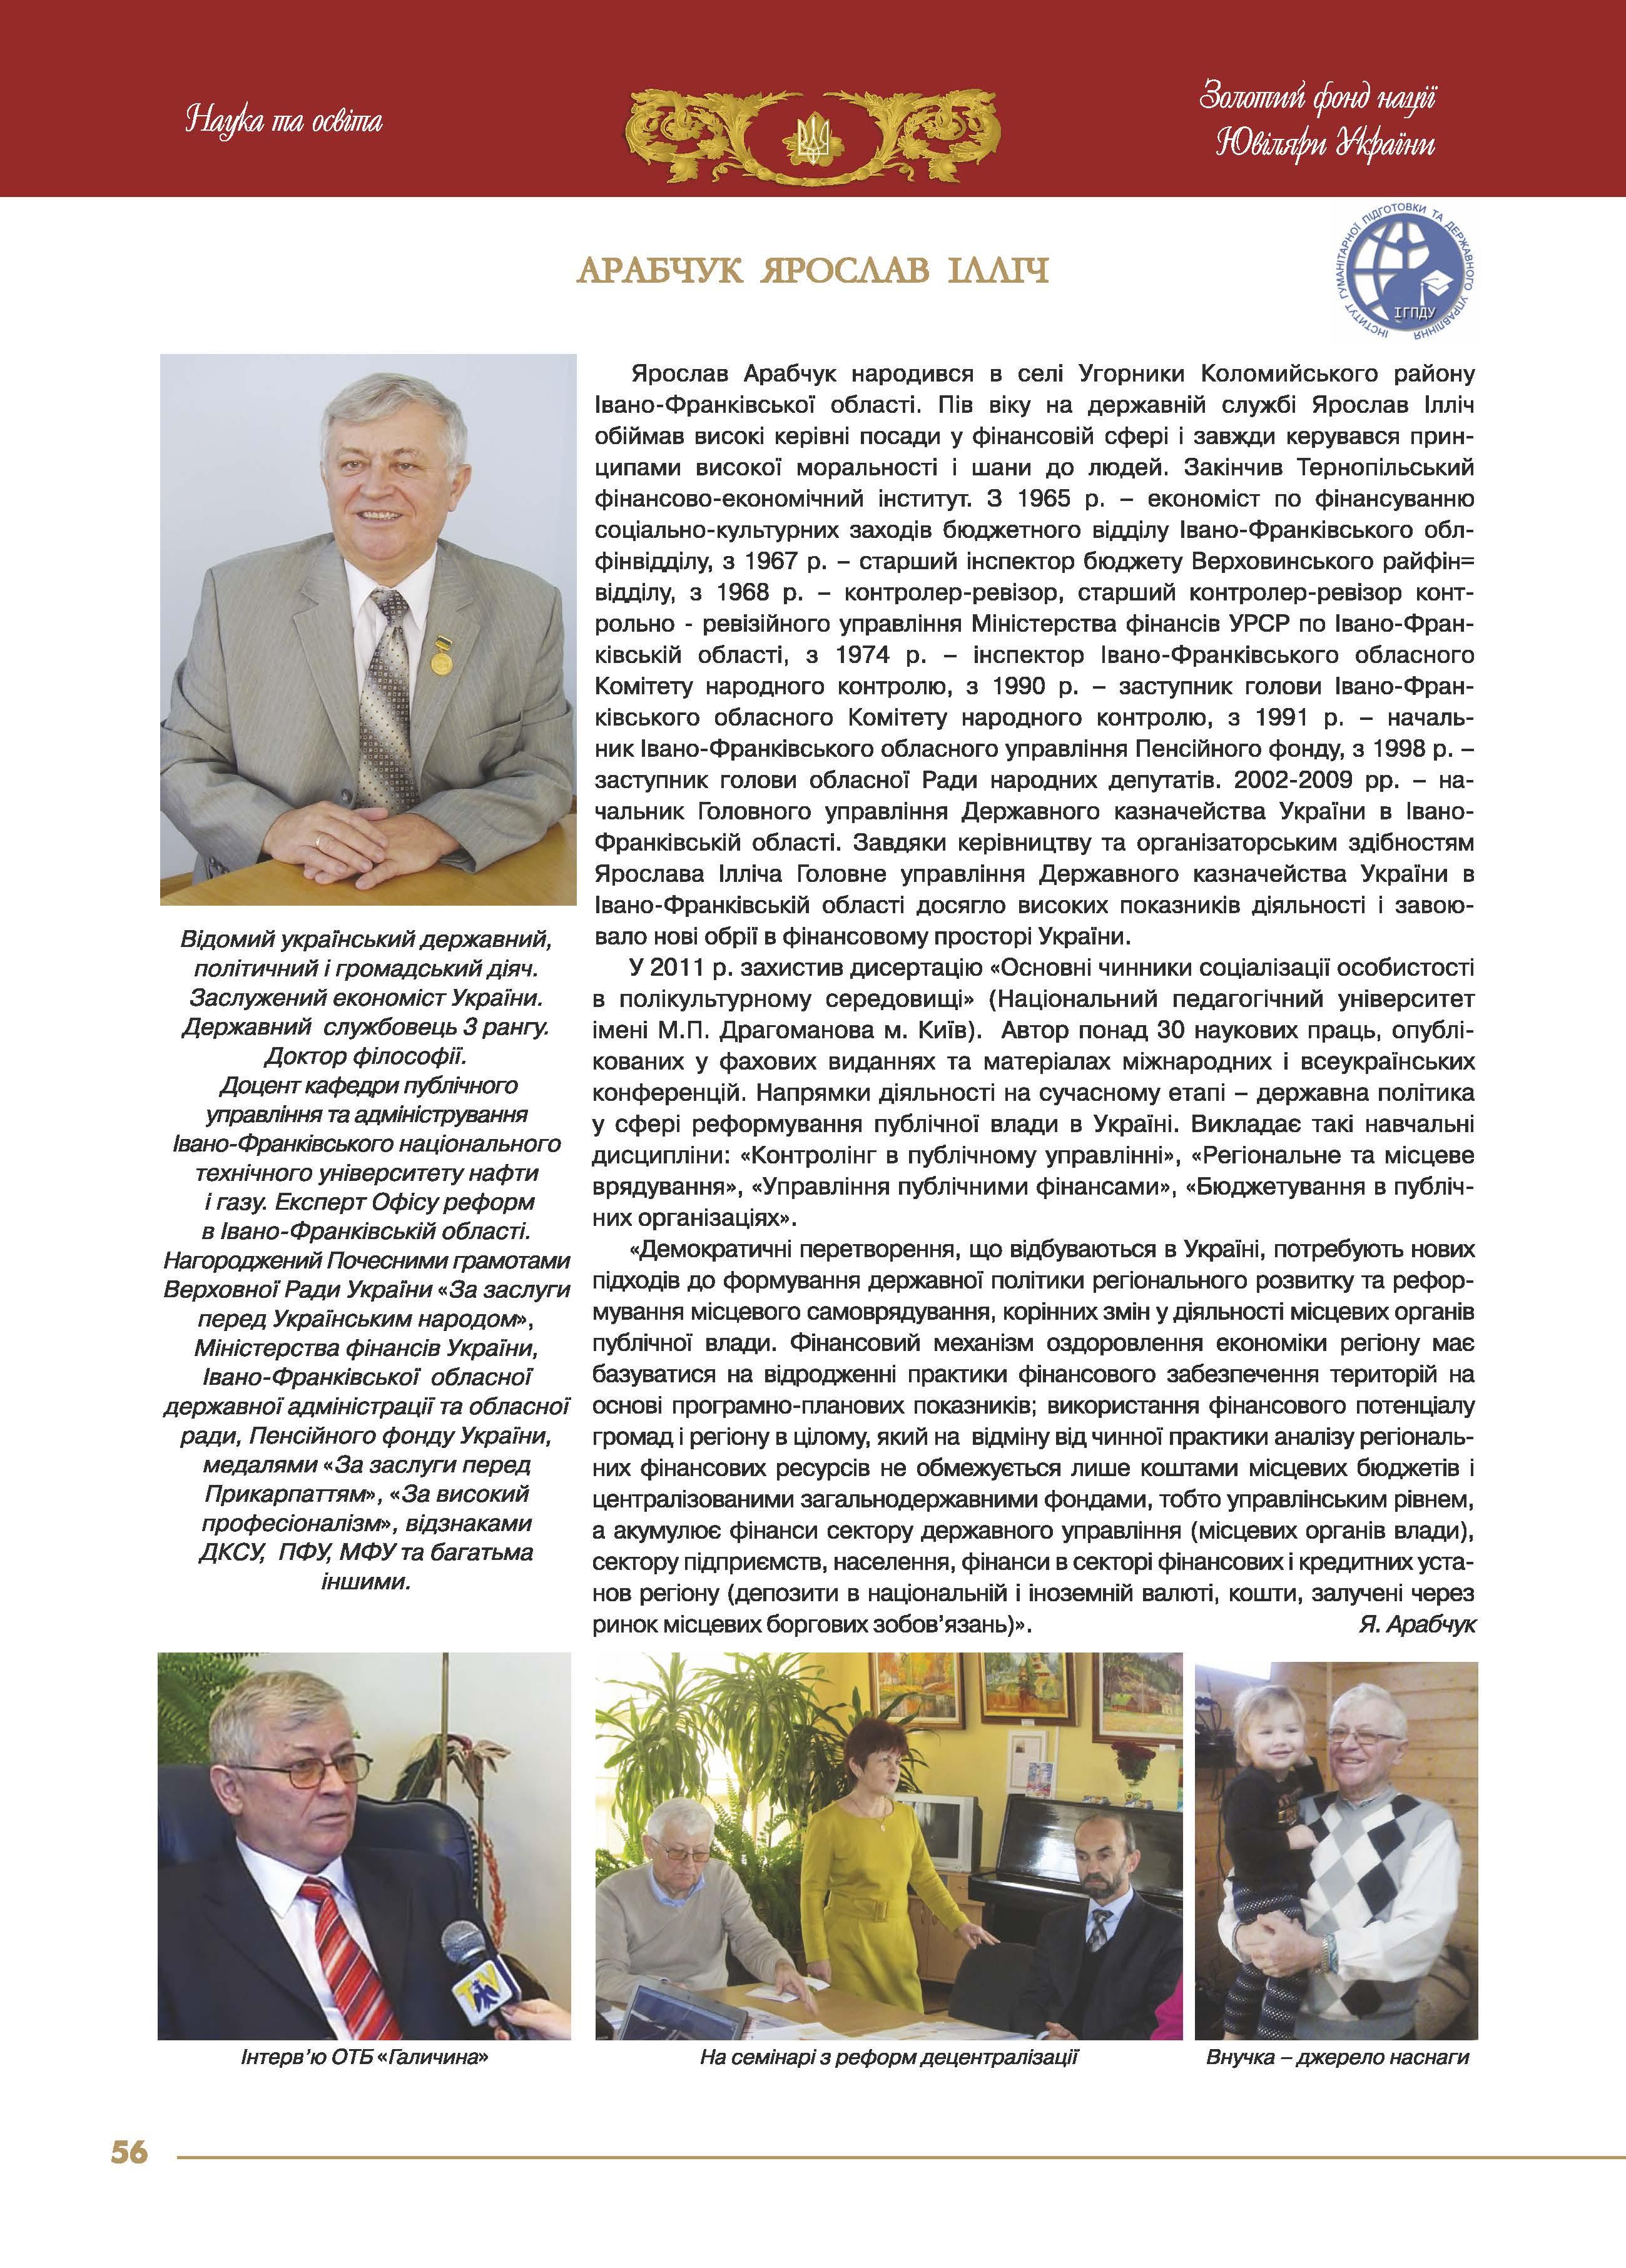 Арабчук Ярослав Ілліч